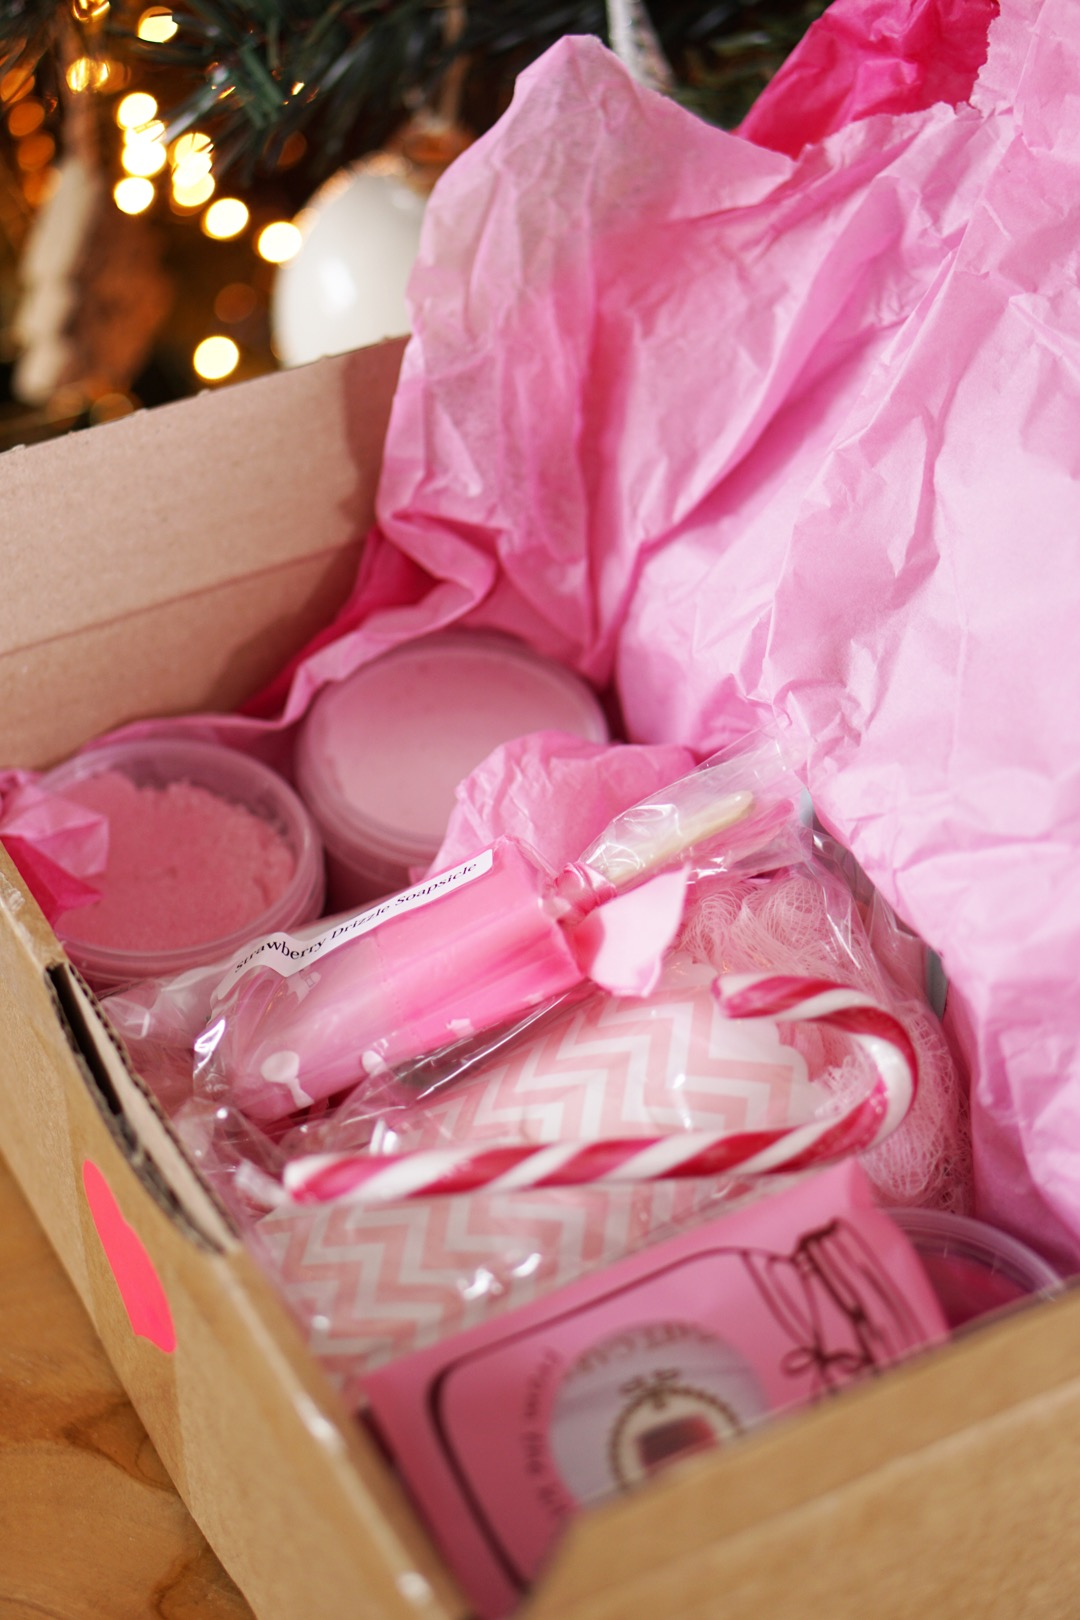 The Beauty Bakery Santa's Gigantic Gift Box